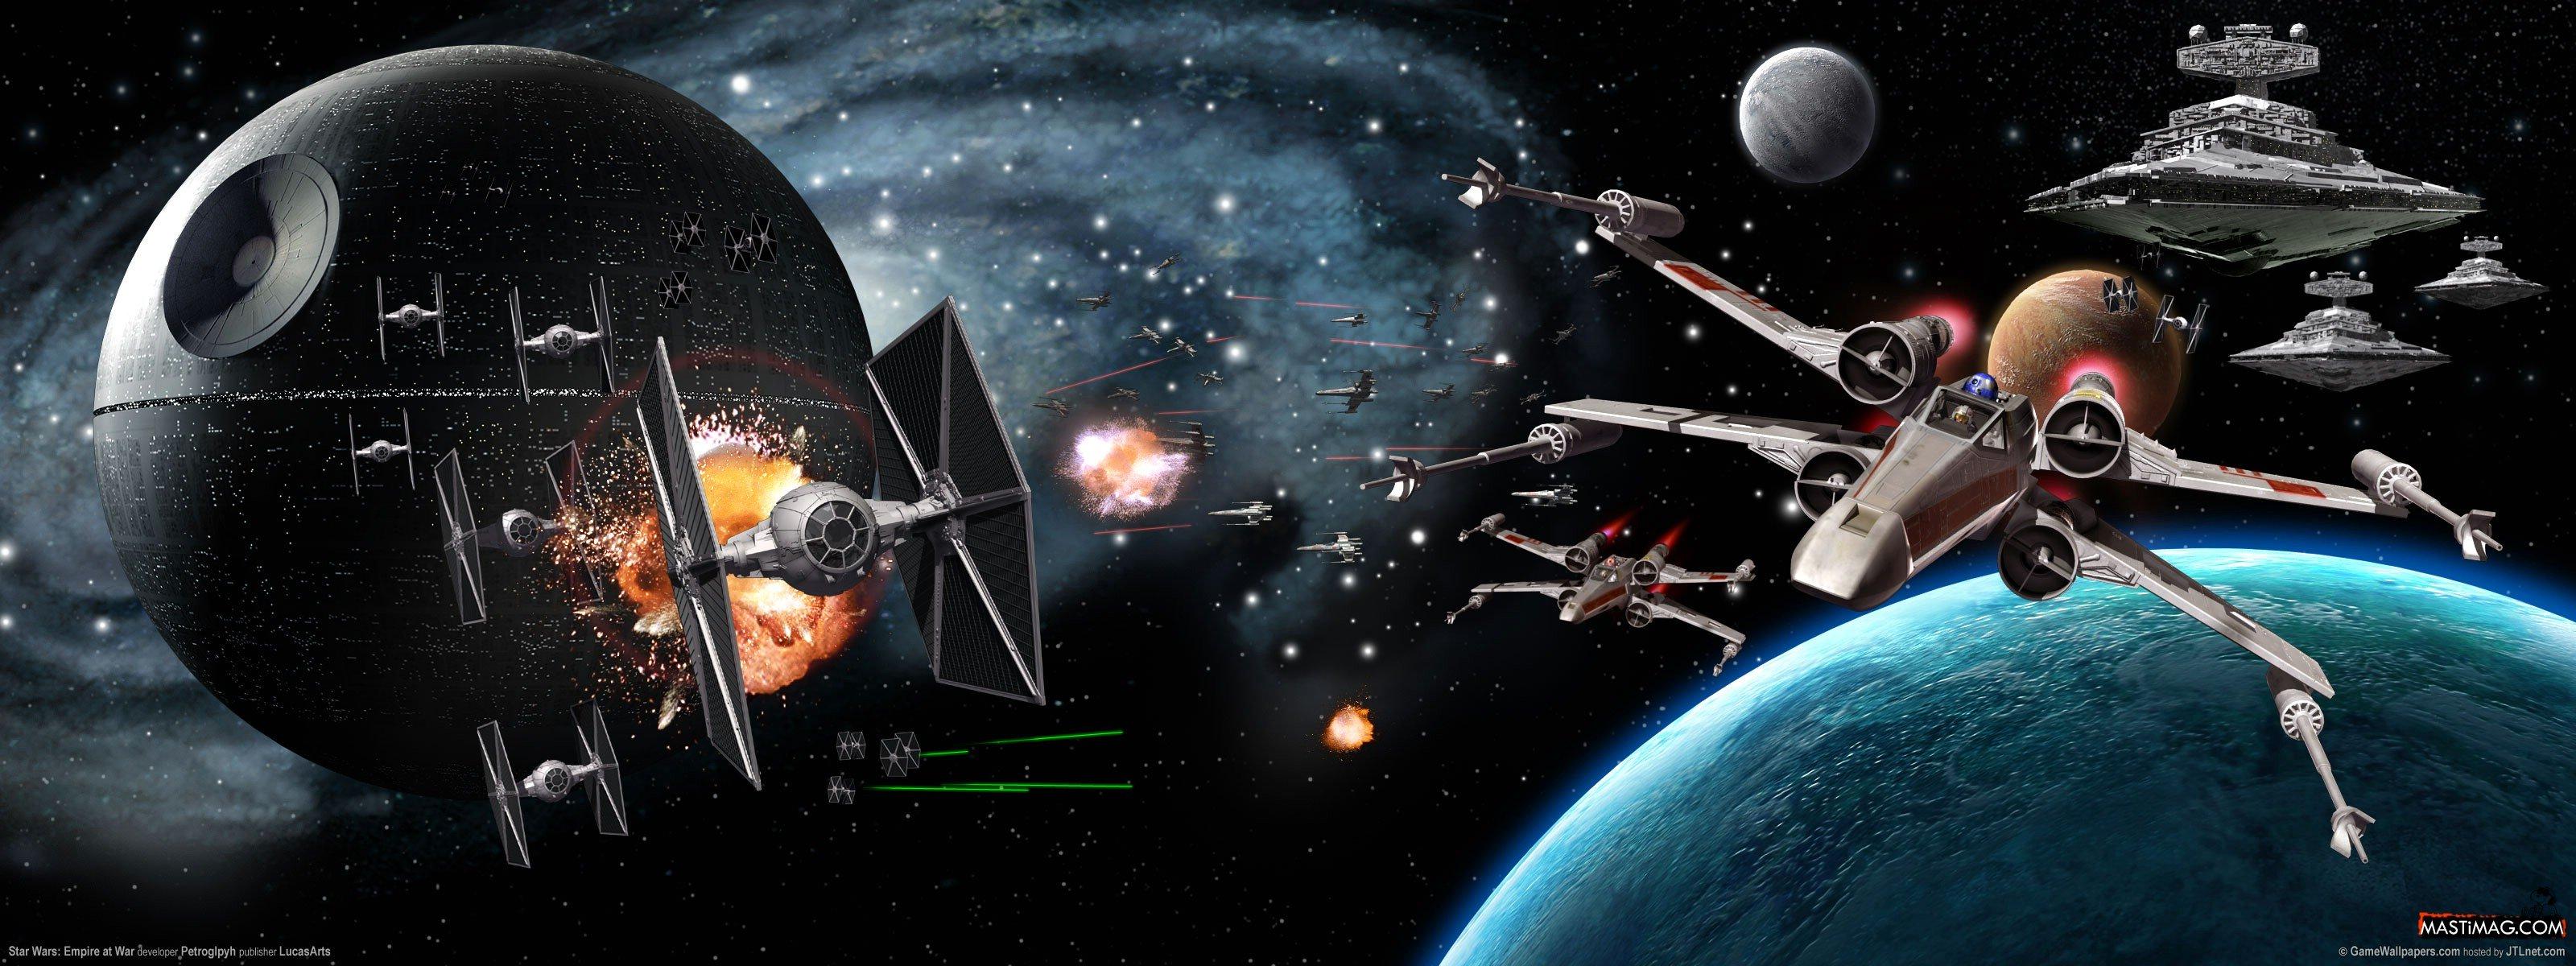 76 Star Wars Desktop Backgrounds On Wallpapersafari